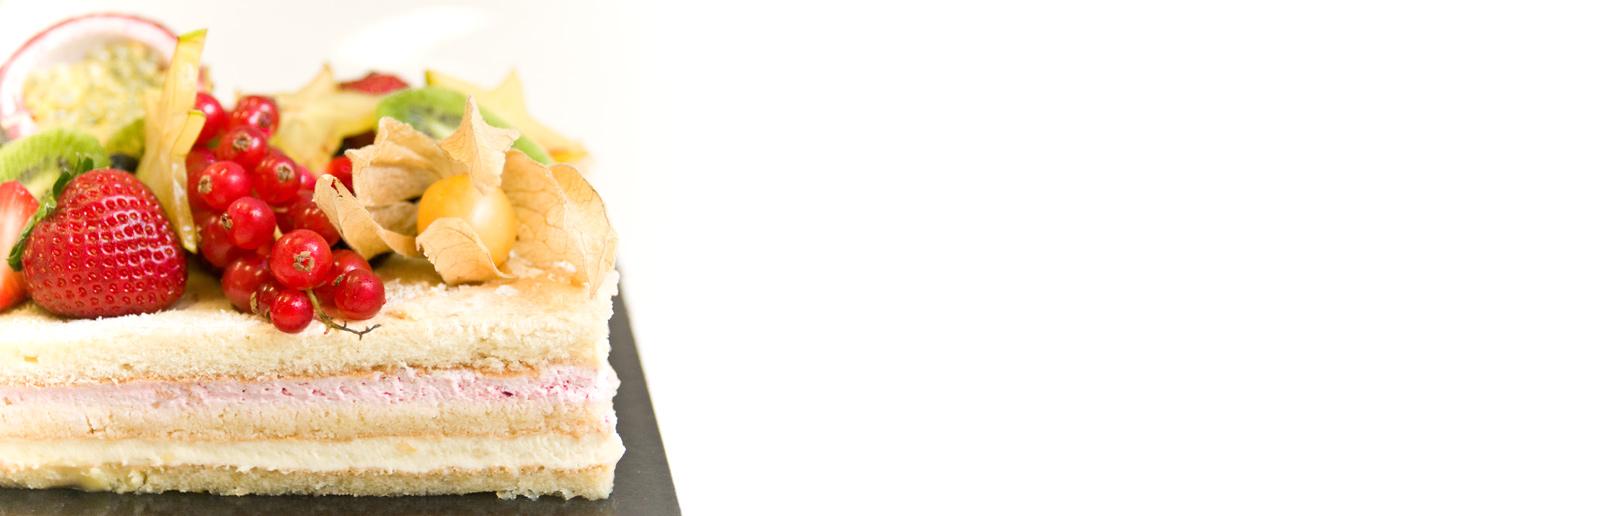 panaderia-christian-pasteleria-malaga